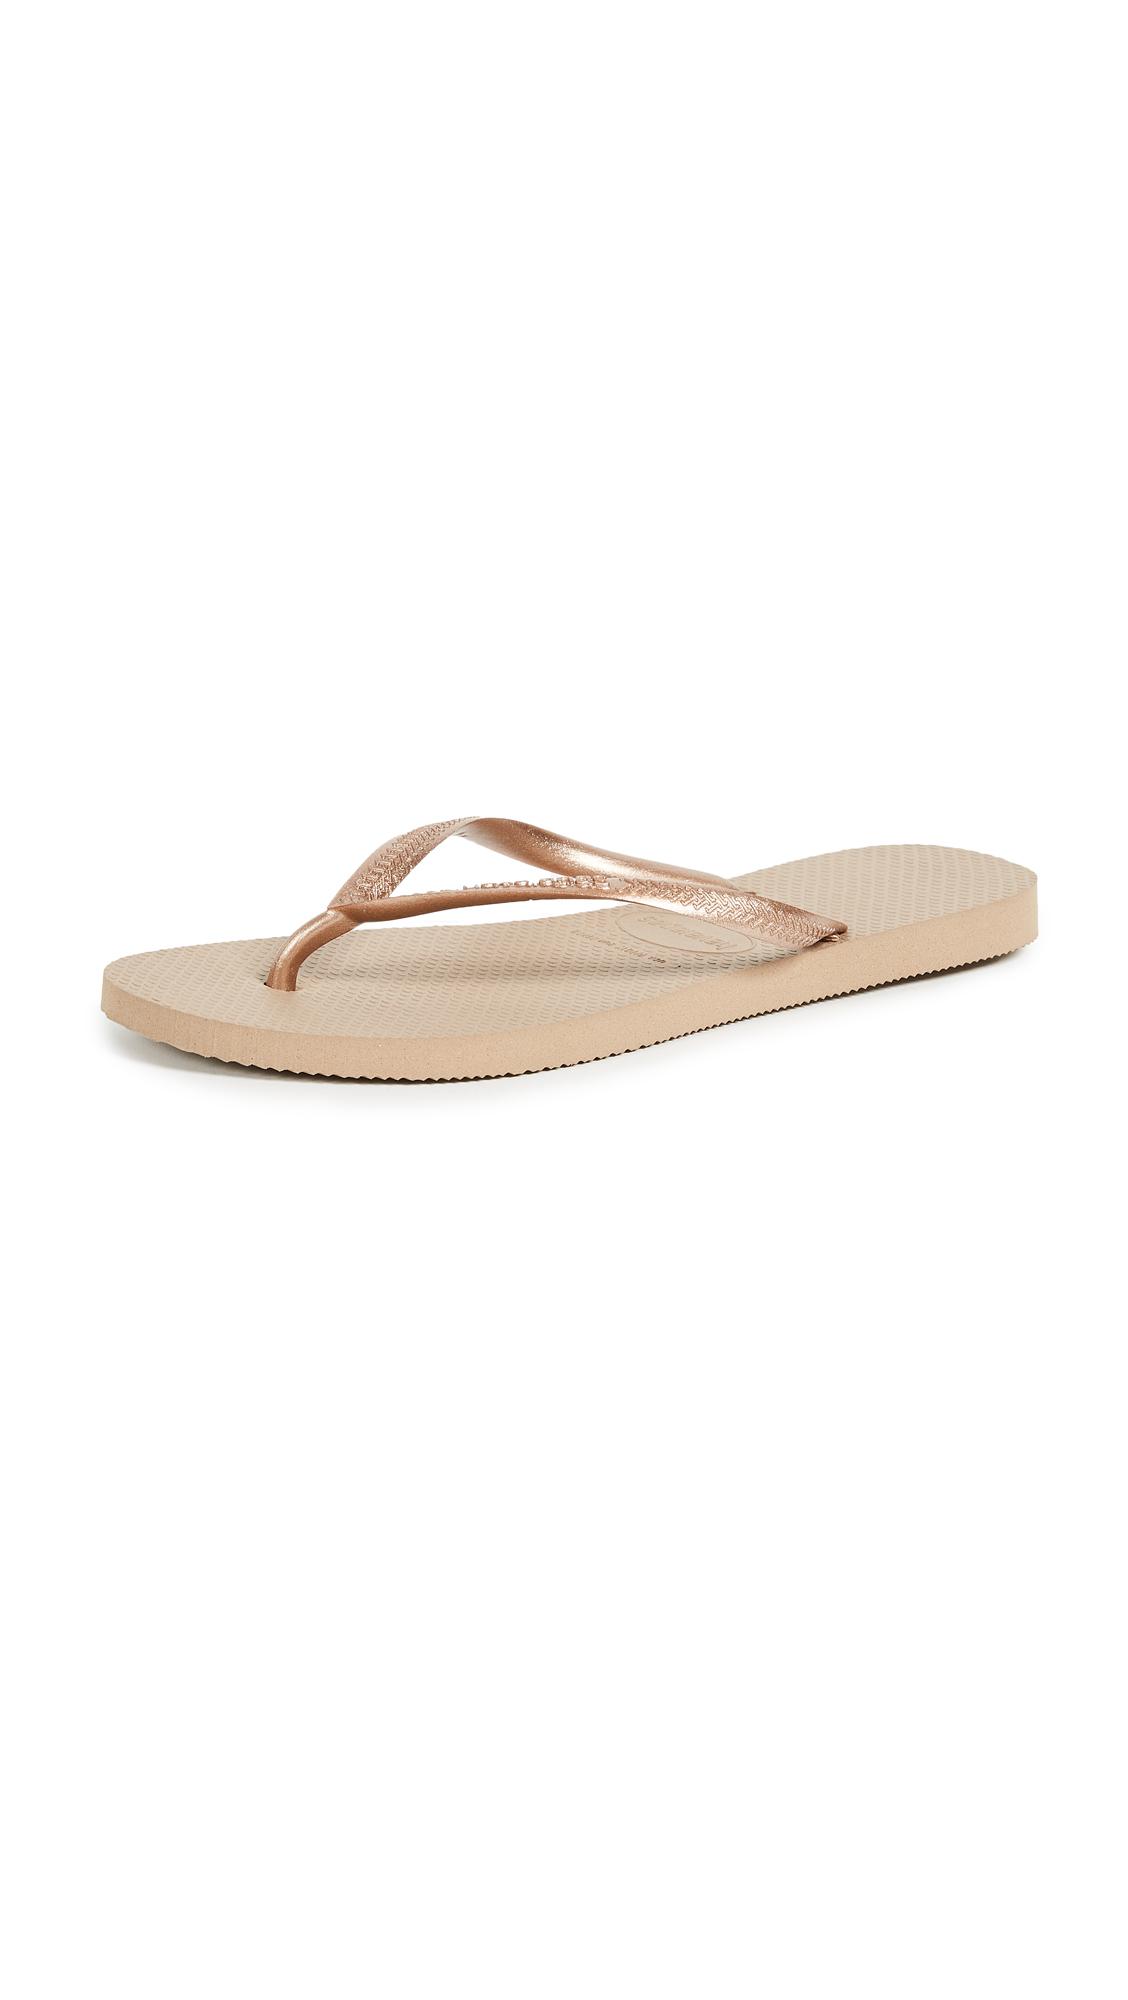 Havaianas Slim Flip Flops - Rose Gold